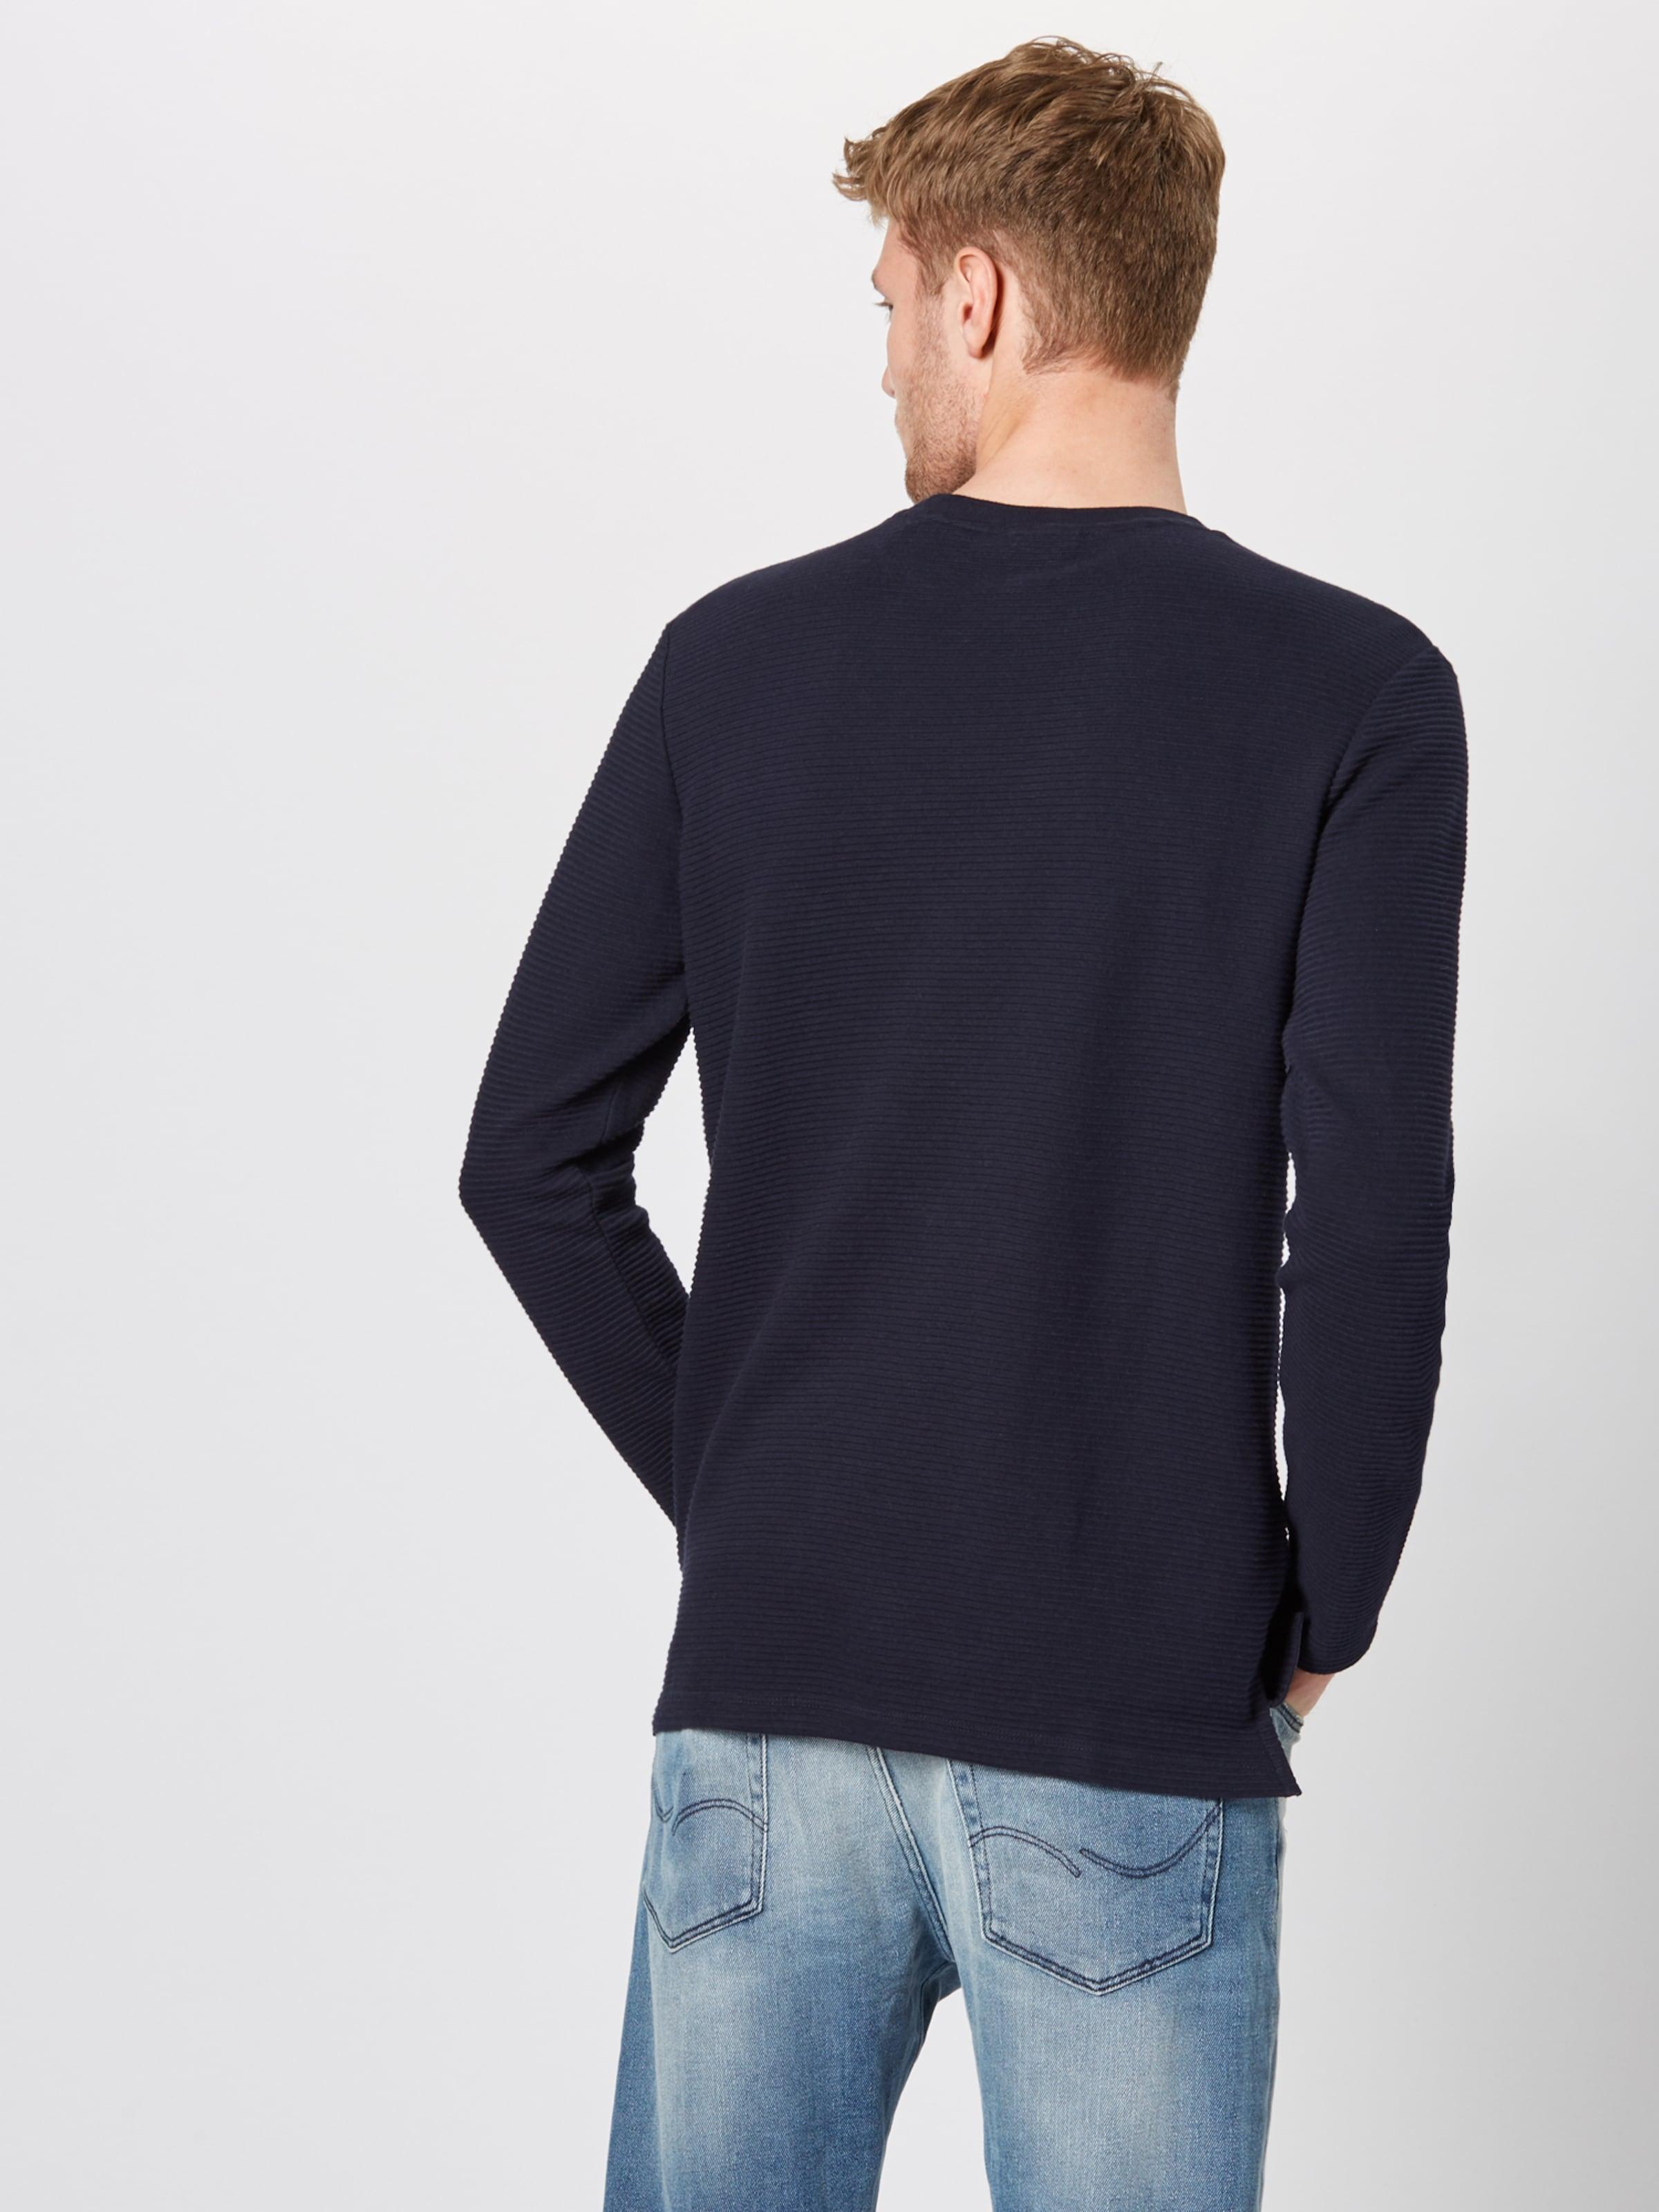 Marc In Nachtblau O'polo Denim Sweatshirt XwiPZuOTk